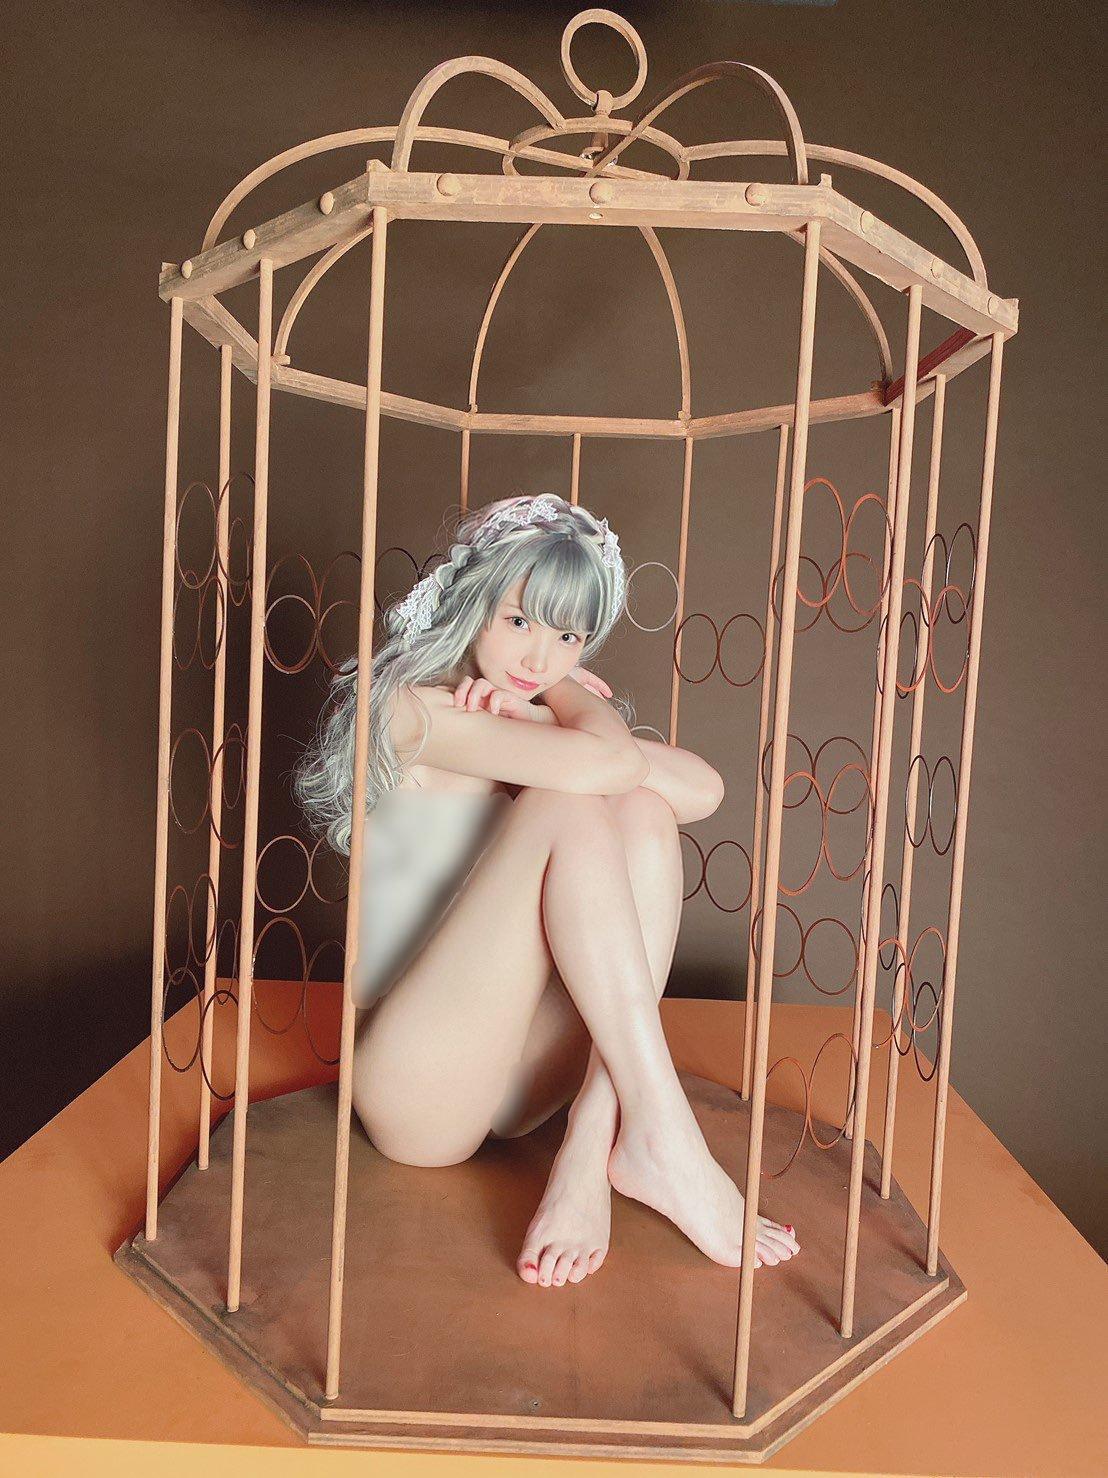 Enako@日本第一Coser的性感蜕变 养眼图片 第7张